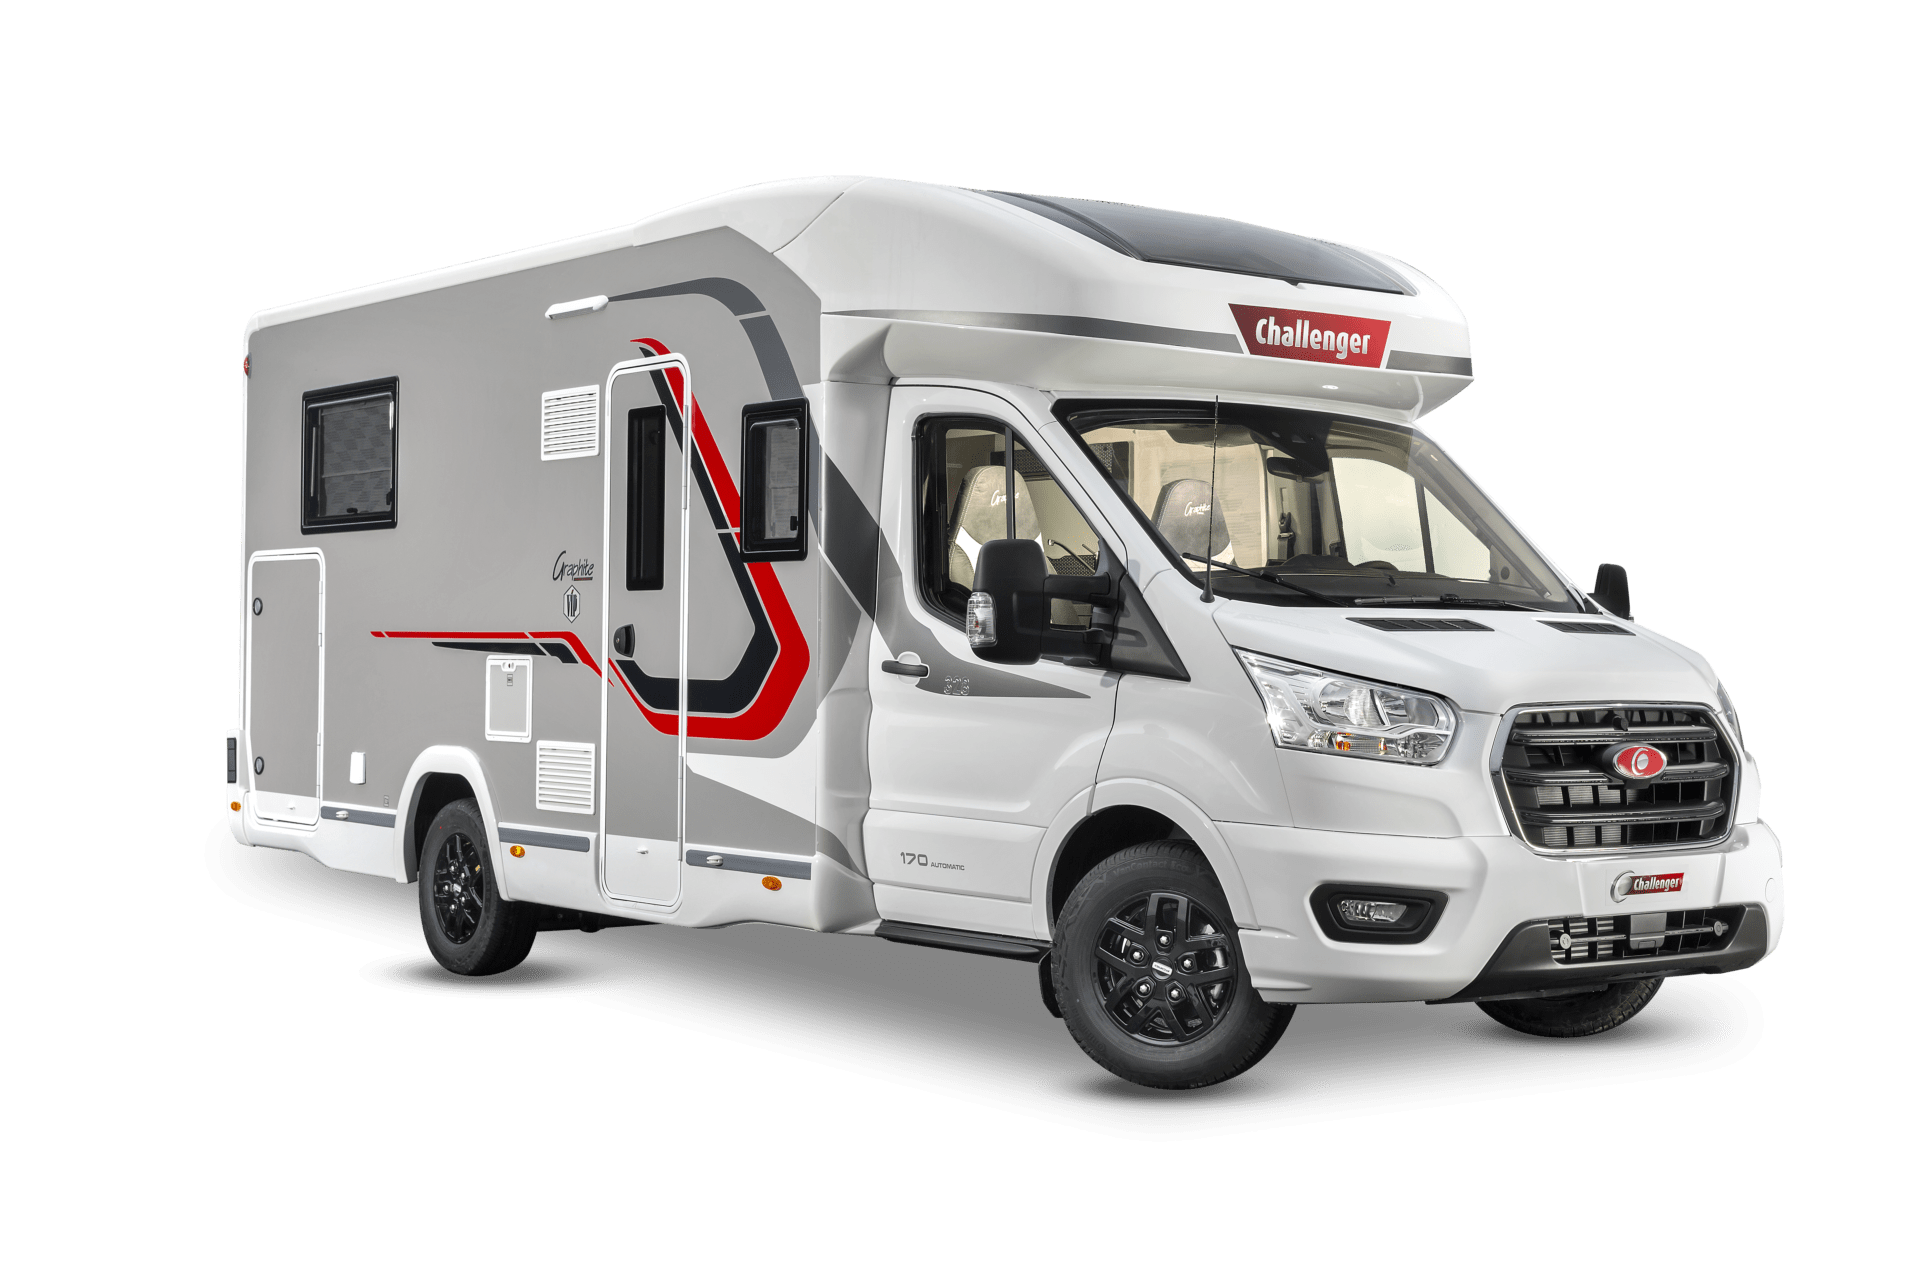 Camping-car Profile 328